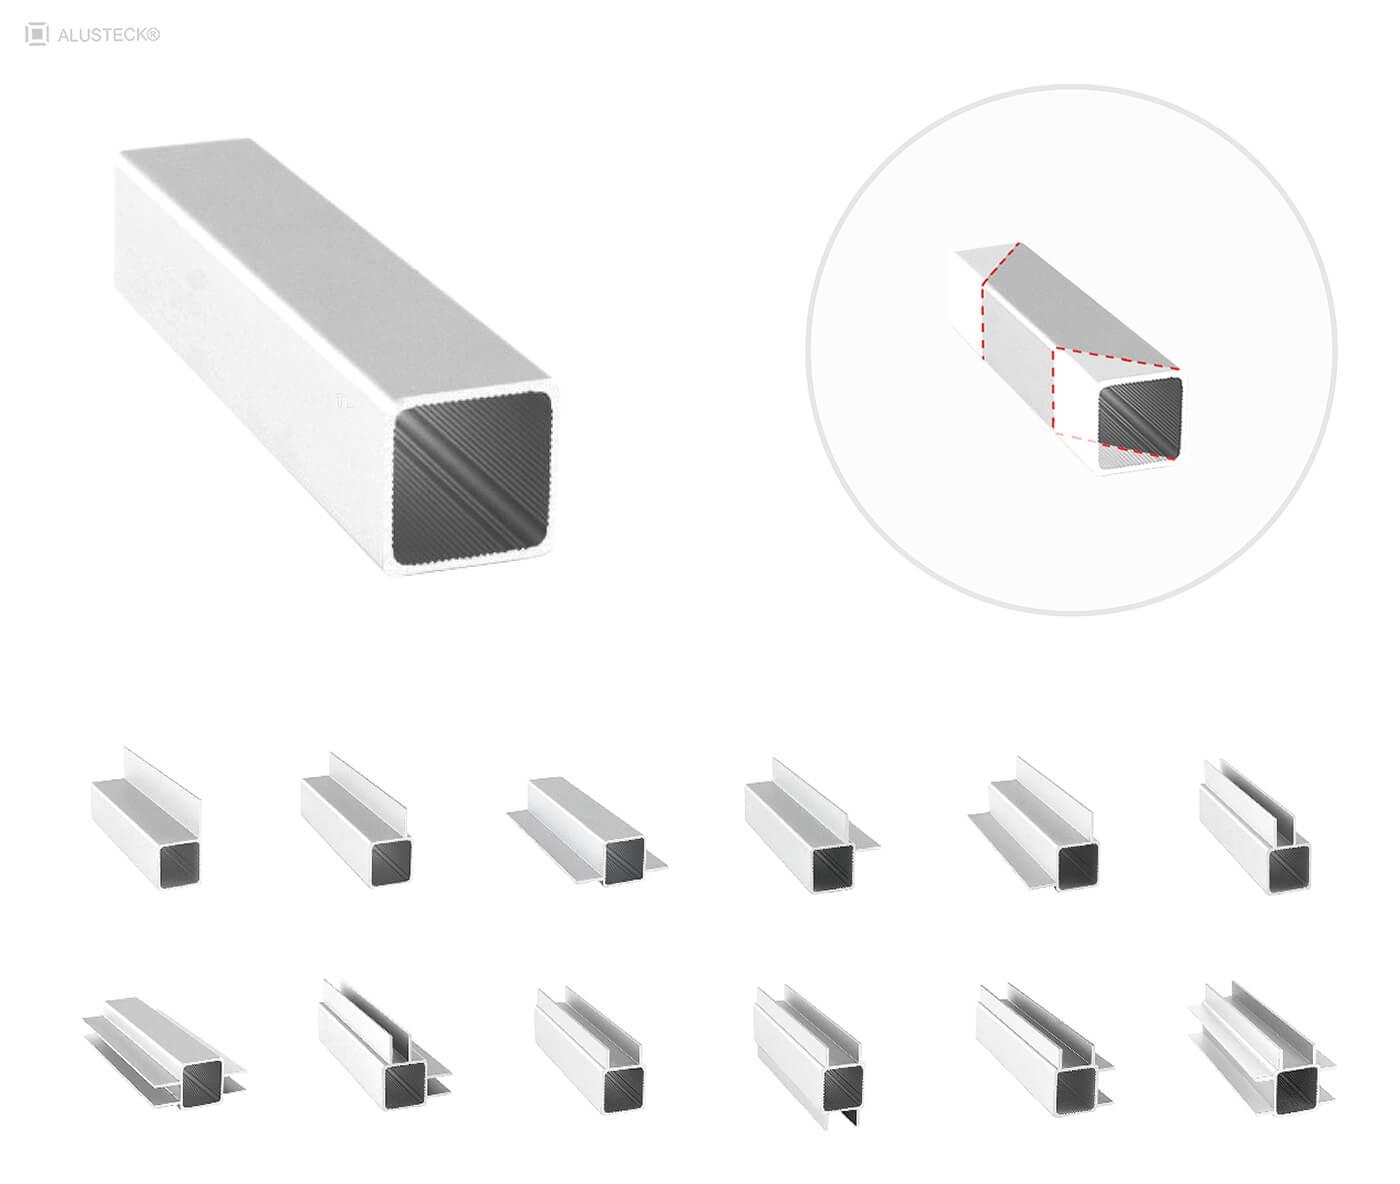 Ladenbausystem Aluminium Rohre Zuschnitt Alusteck